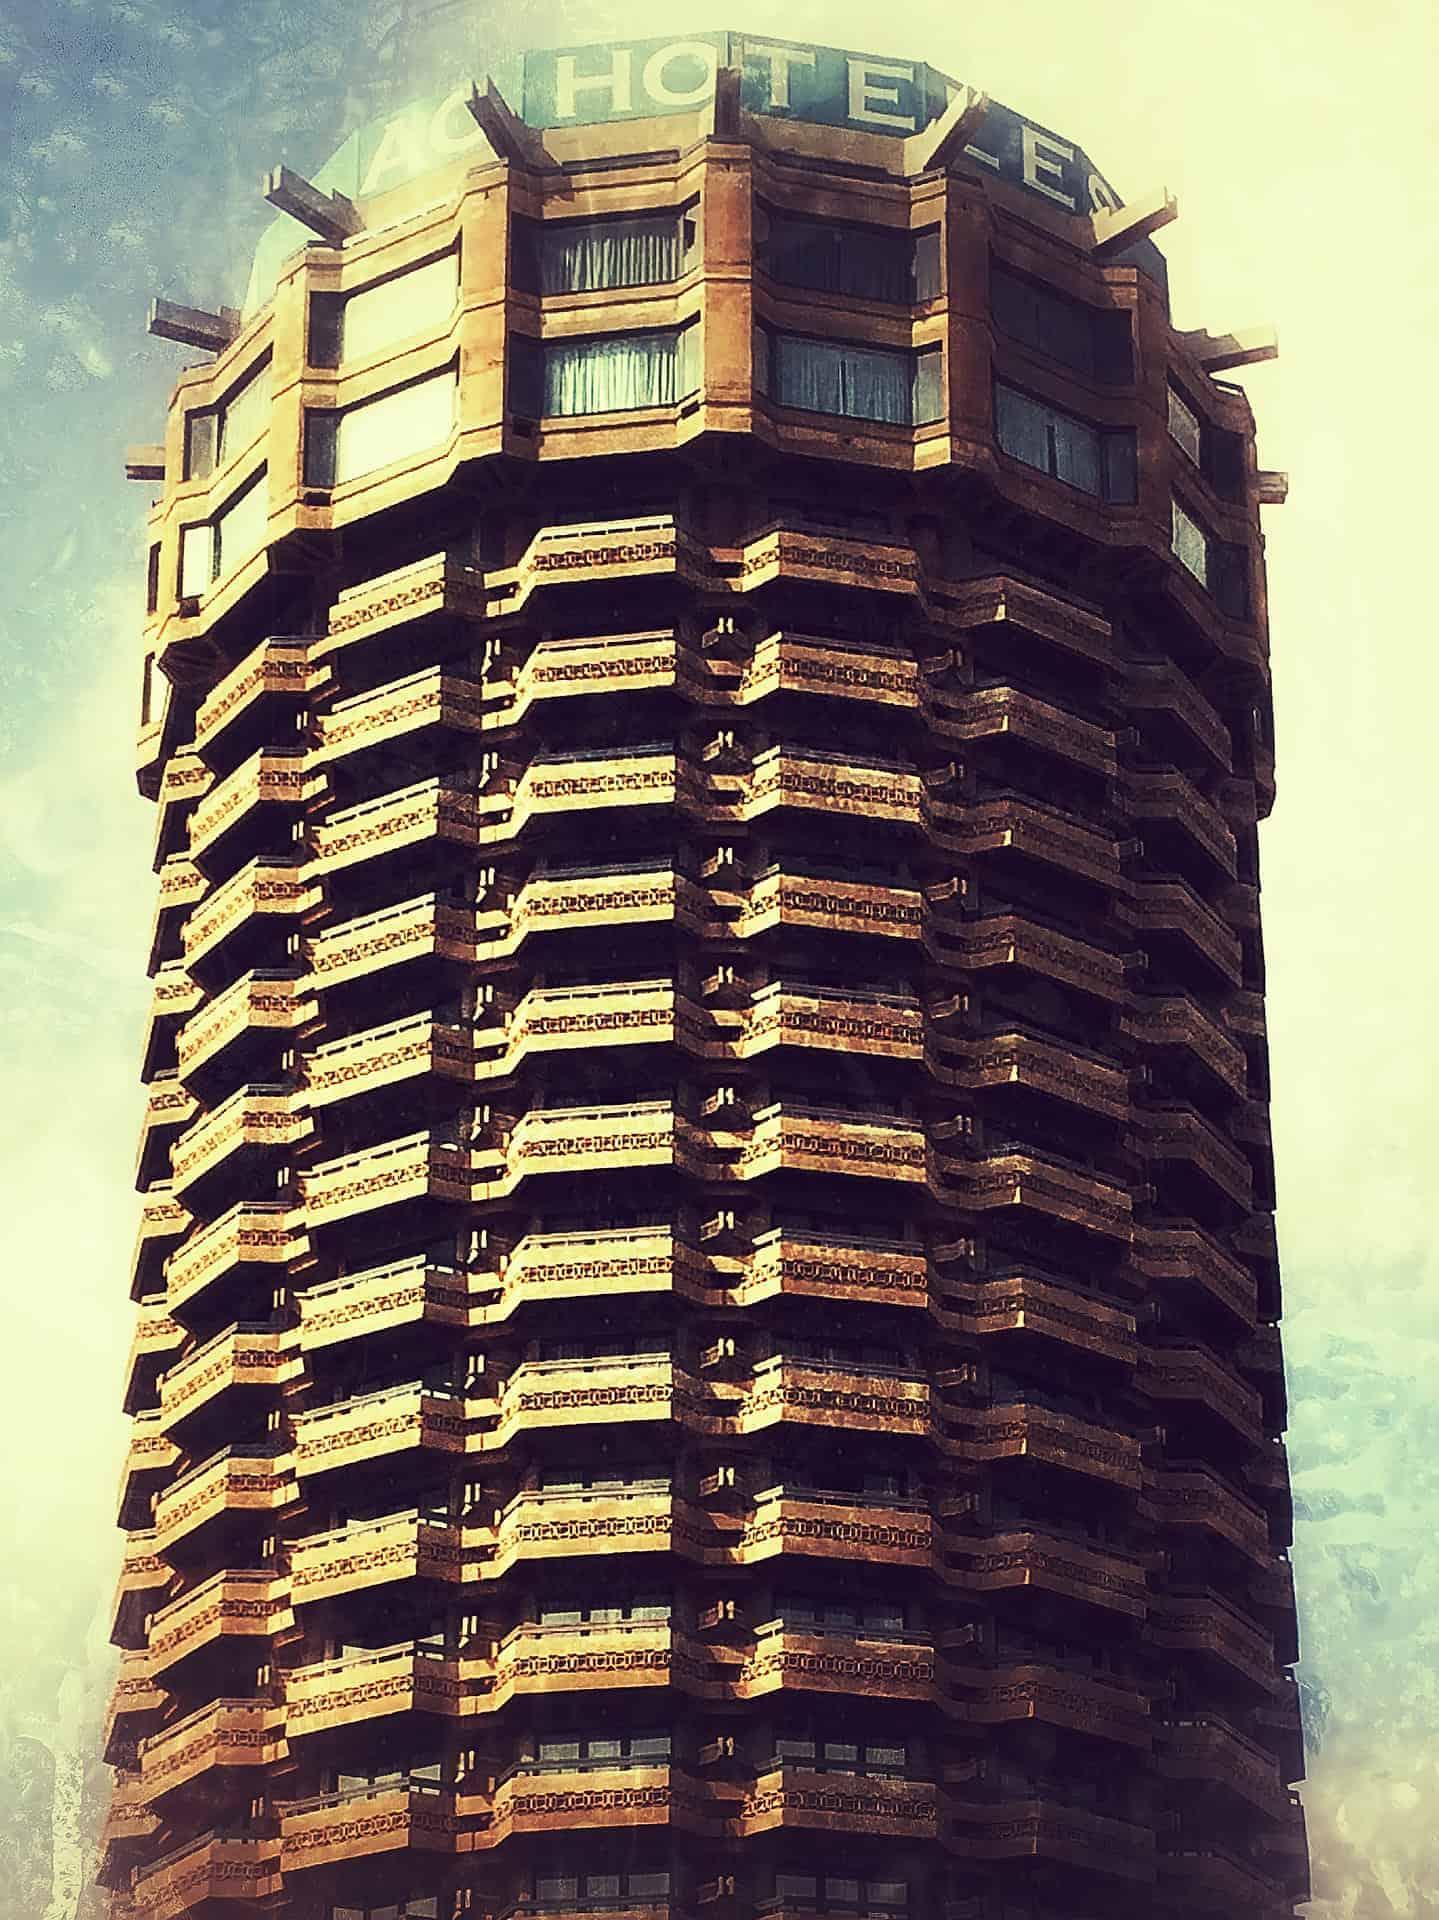 artnorama - Hotel